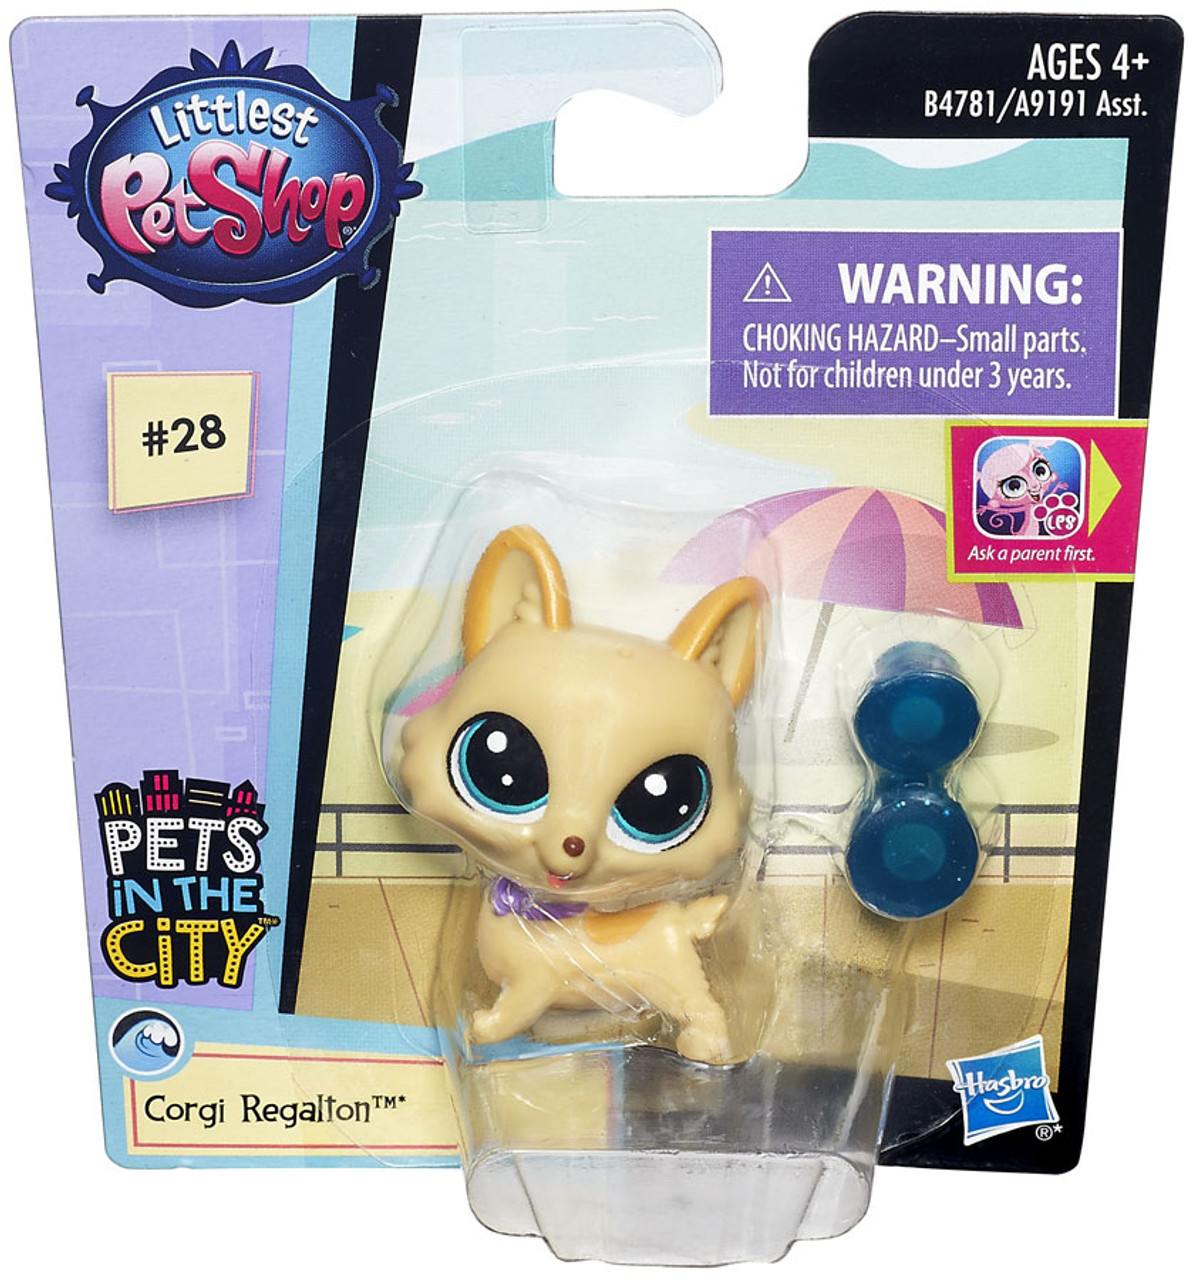 Corgi Lps Roblox Littlest Pet Shop Pets In The City Single Figure Corgi Regalton Toywiz